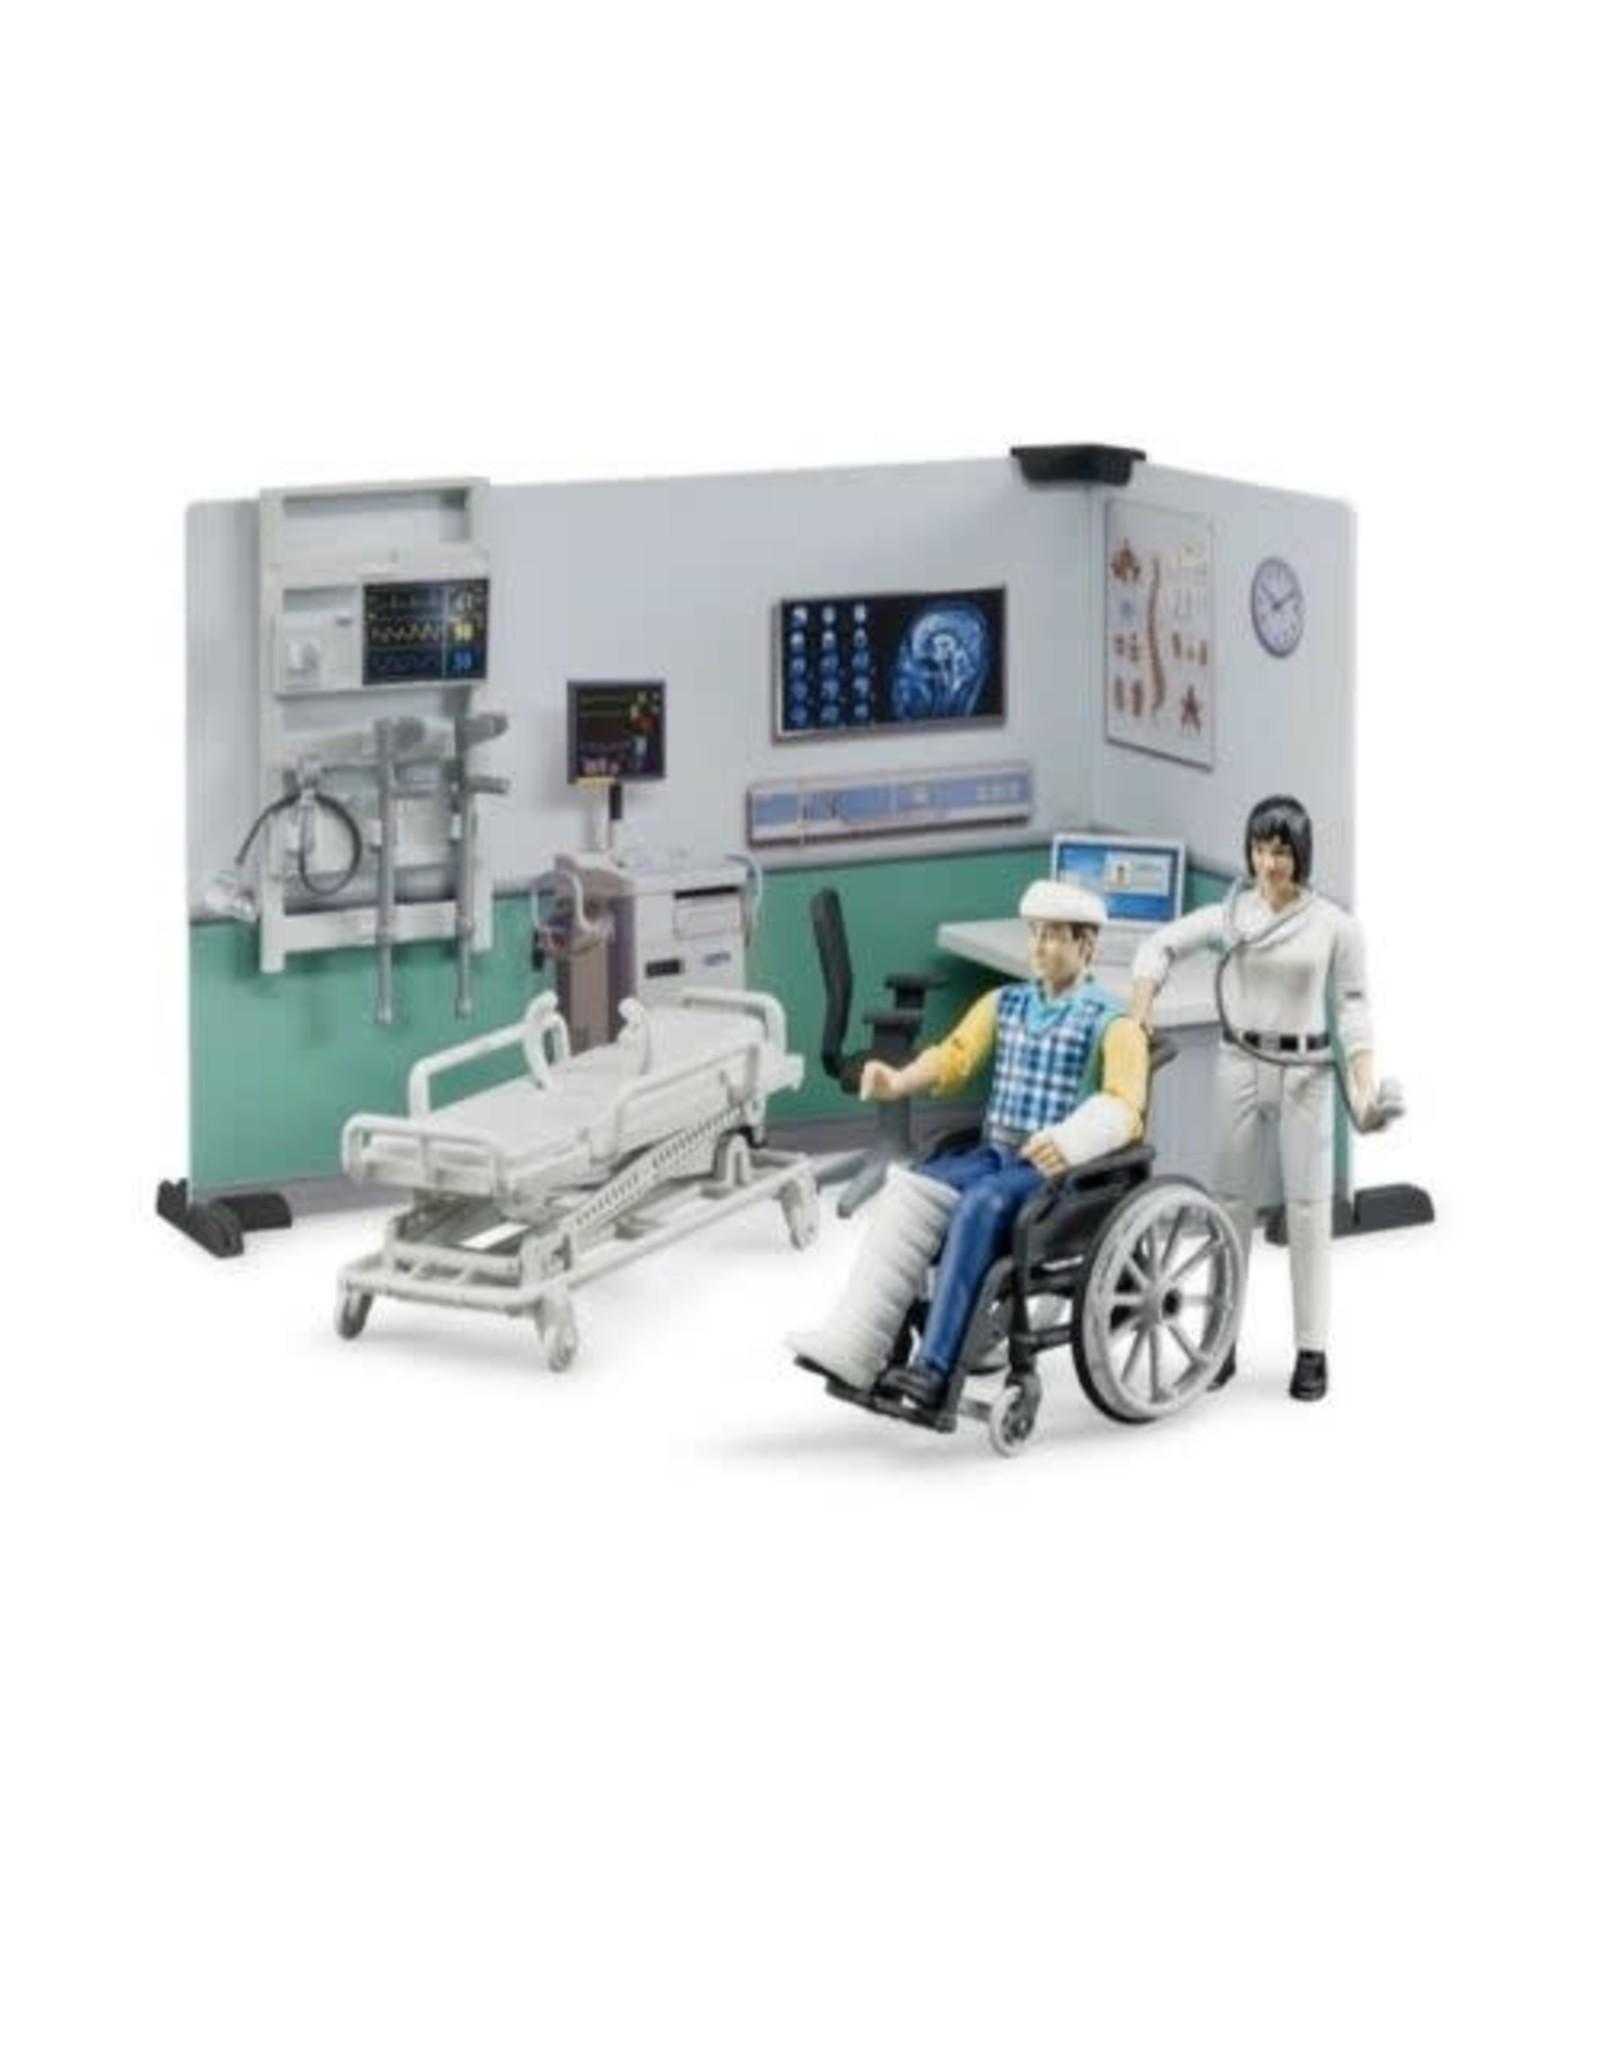 BRUDER Bworld Health Station 62711